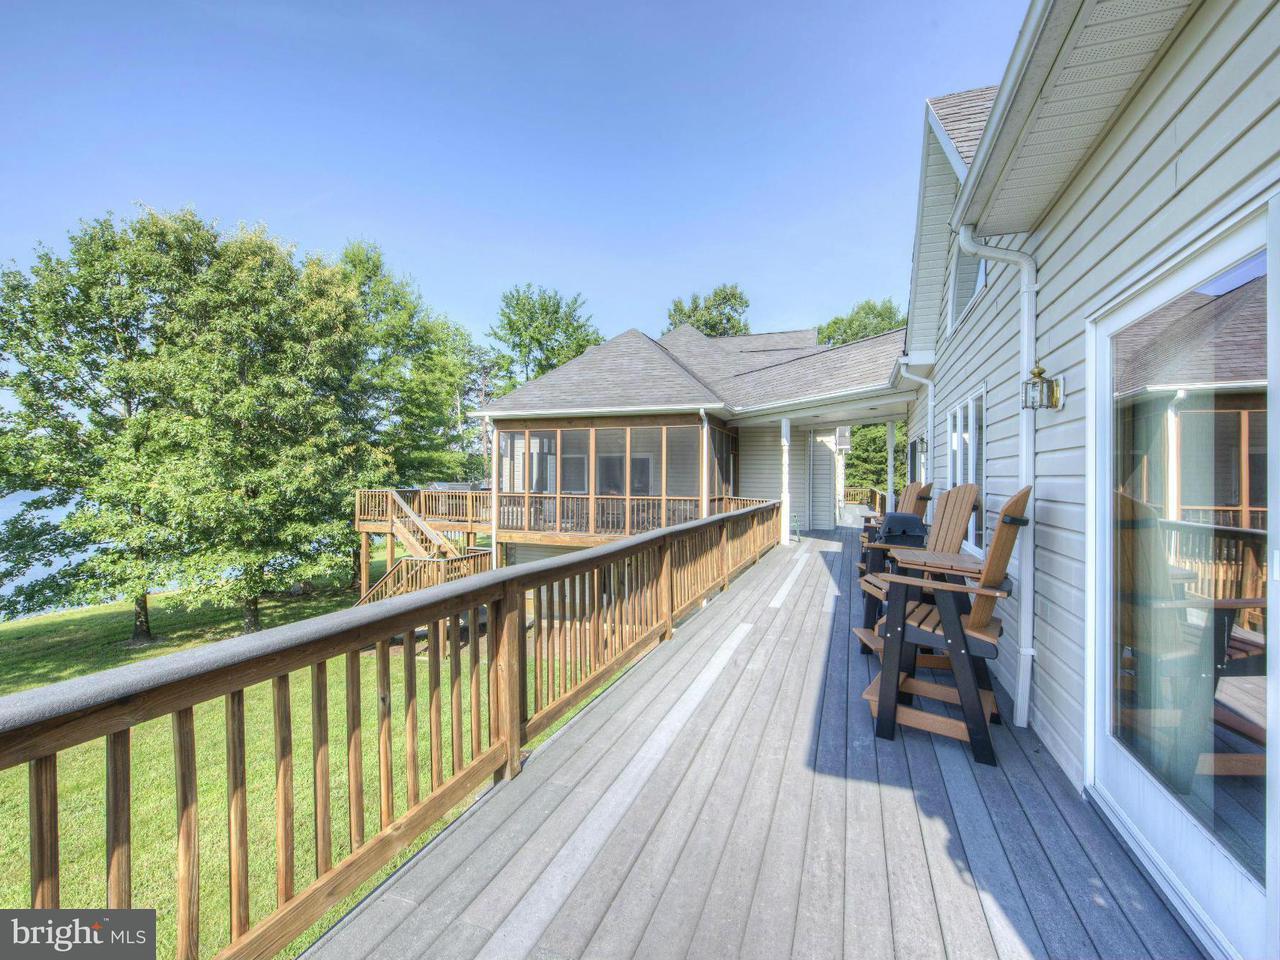 Additional photo for property listing at 9675 KENTUCKY SPRINGS Road 9675 KENTUCKY SPRINGS Road Mineral, Виргиния 23117 Соединенные Штаты